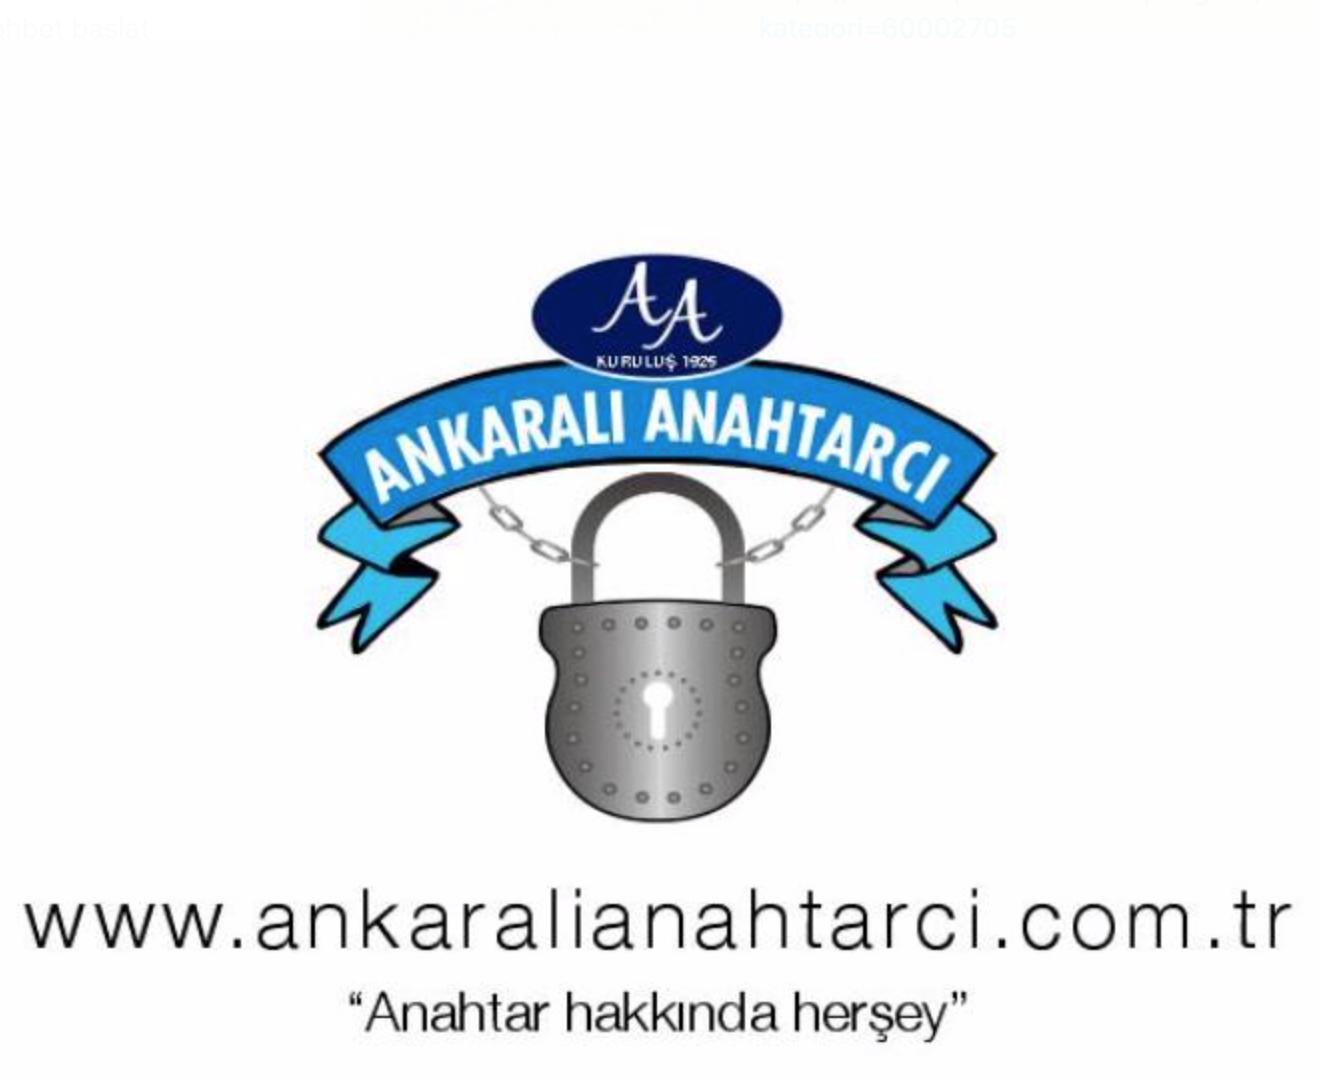 Ankaralı Anahtarcı